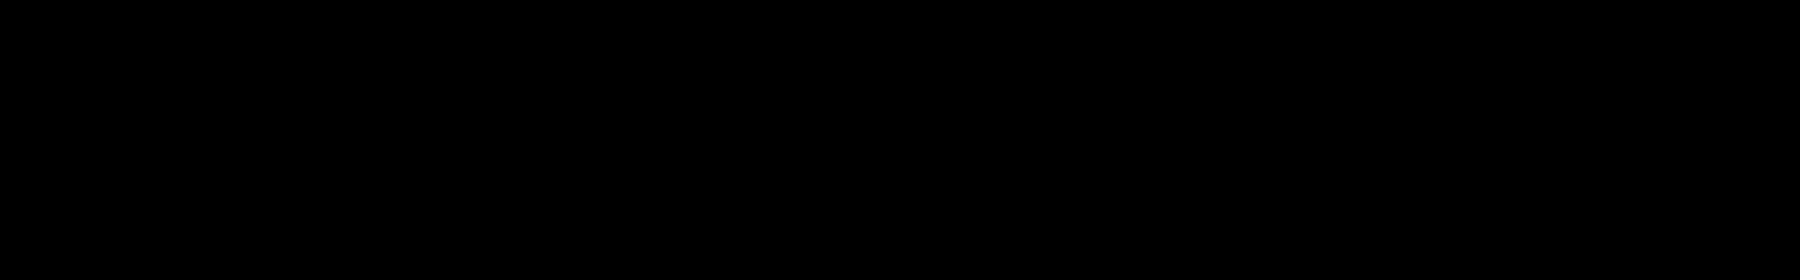 Tsukimi Lofi audio waveform